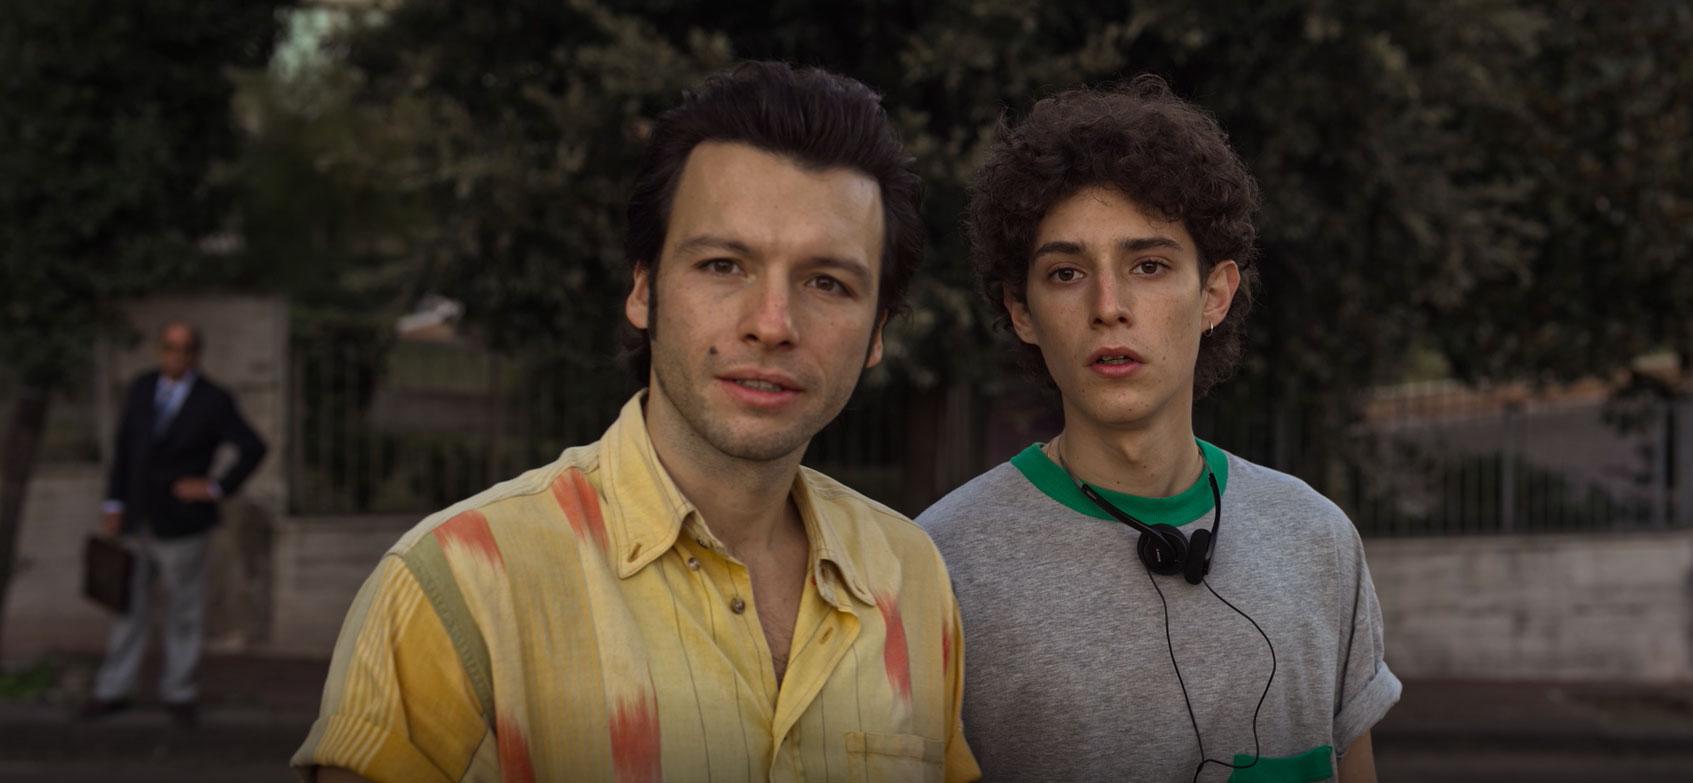 Marlon Joubert y Filippo Scotti